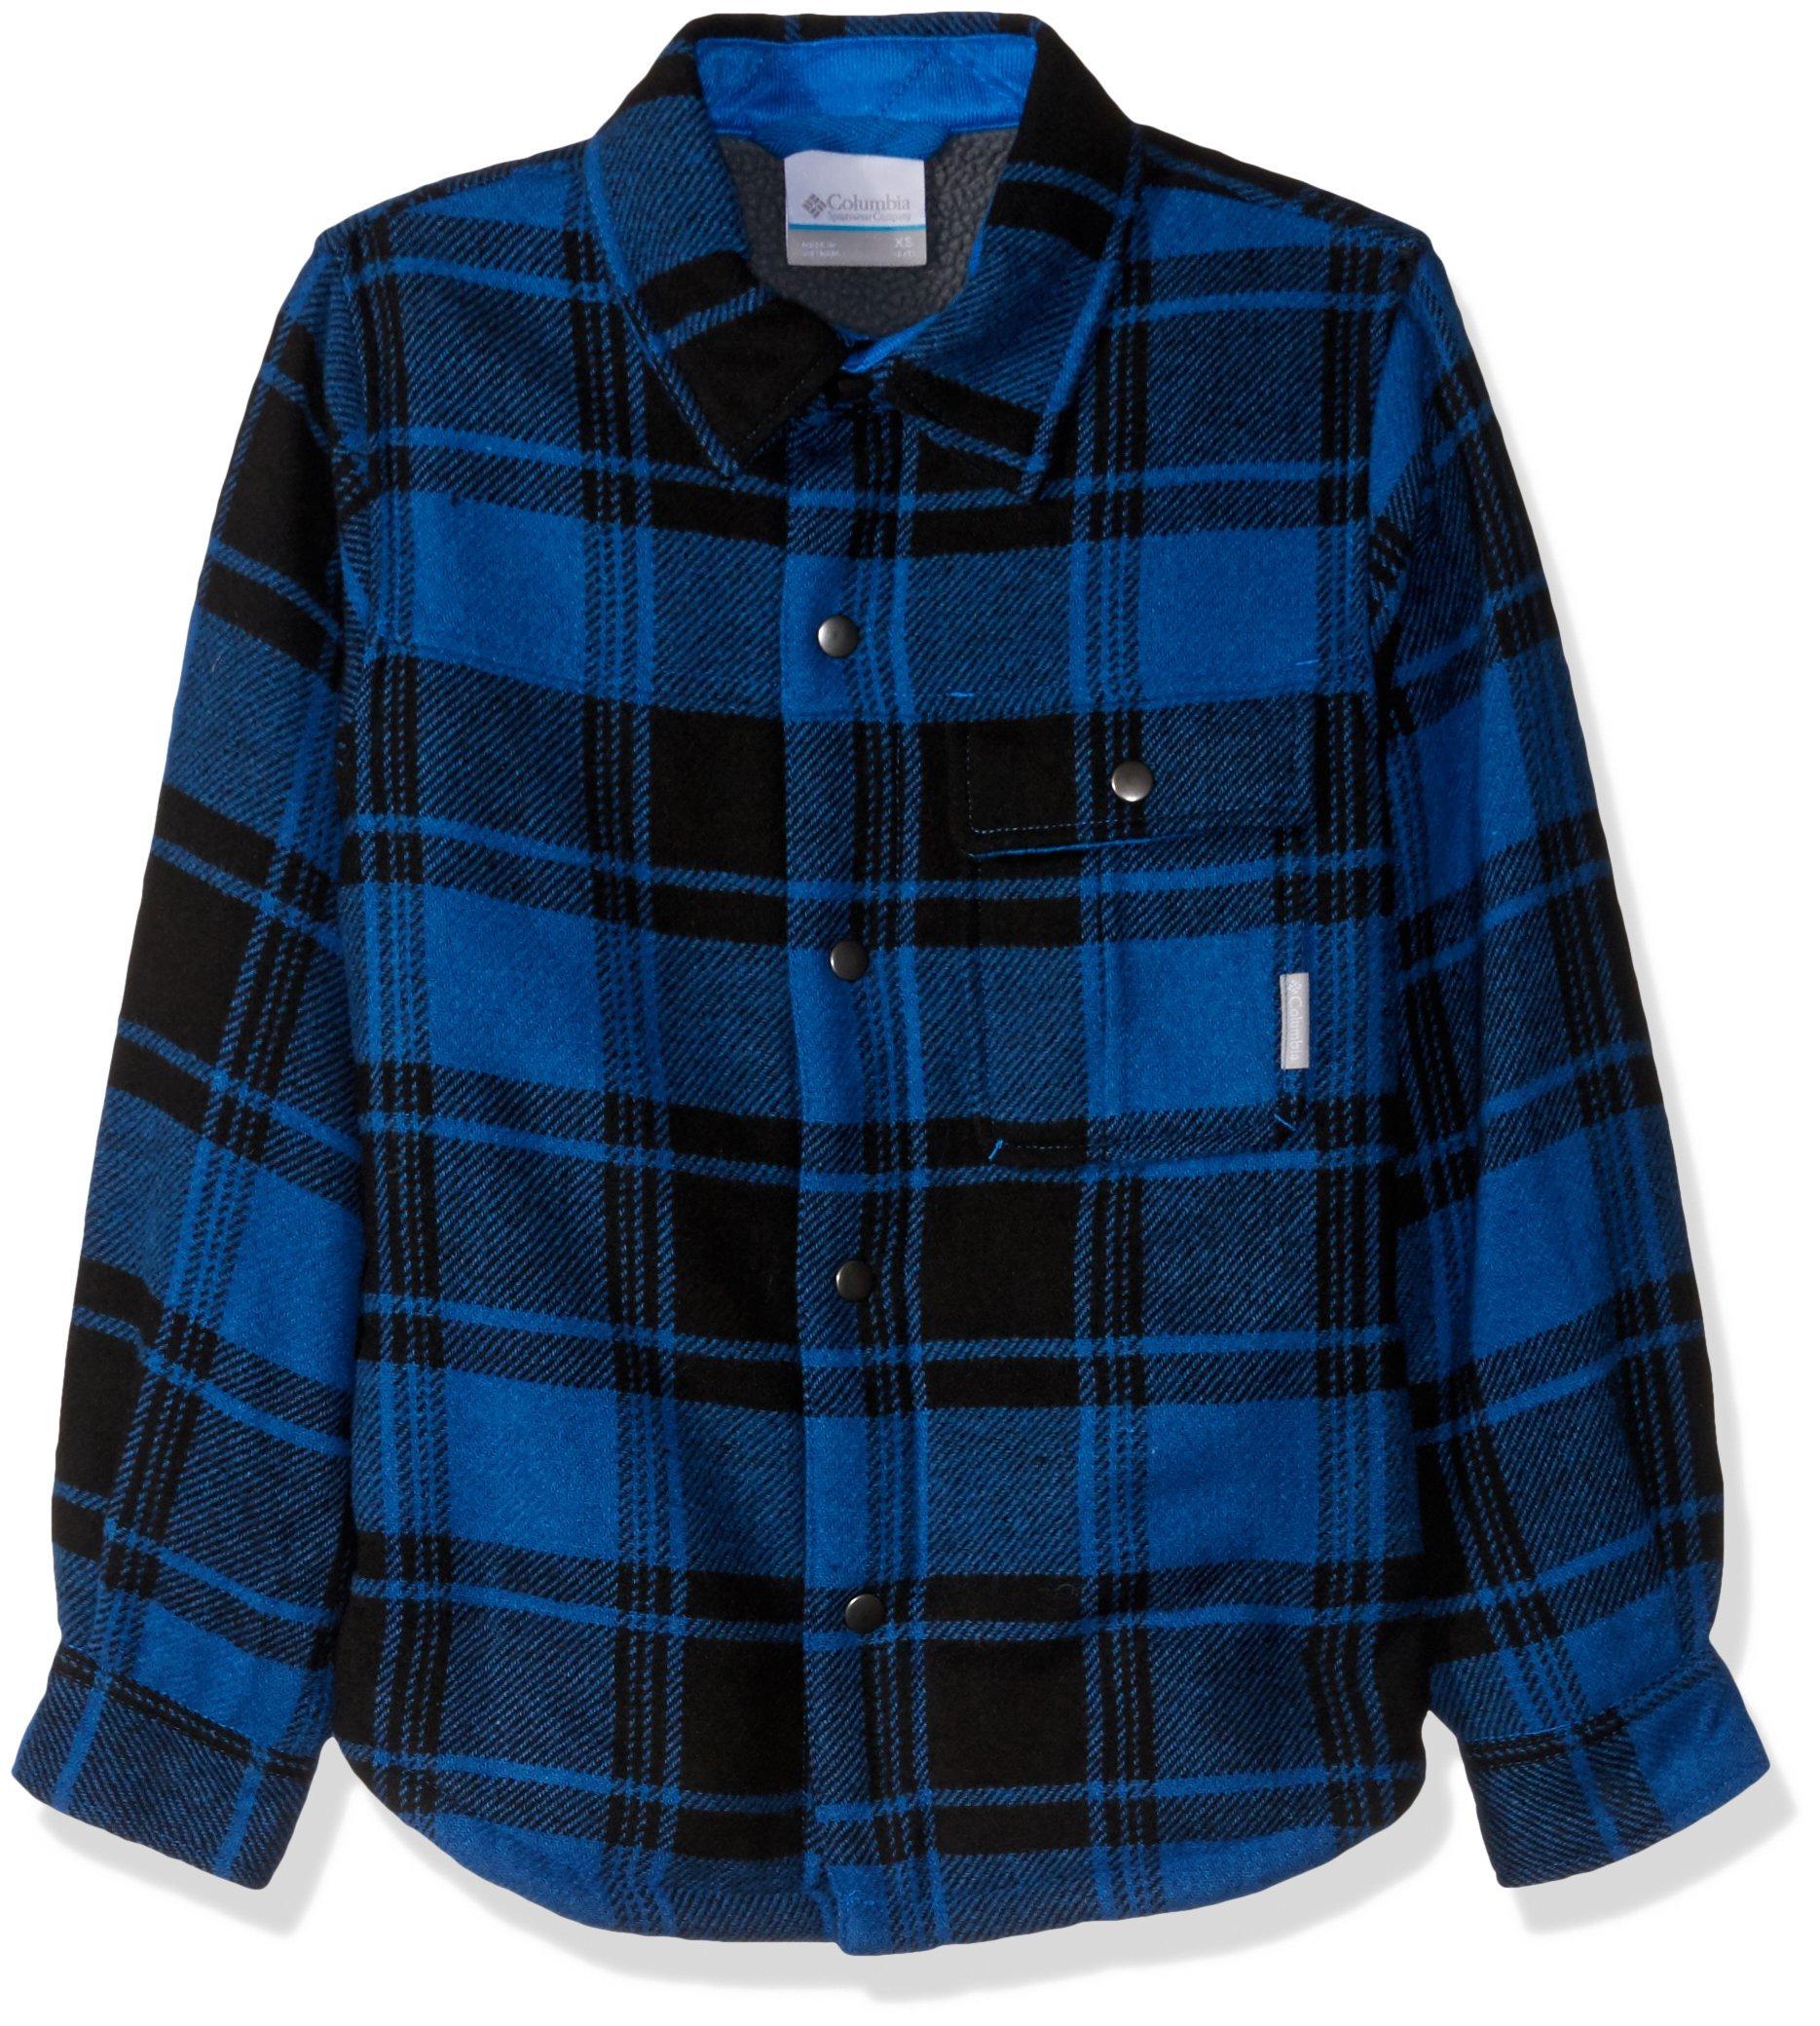 Columbia Boys' Big Windward Sherpa-LinedShirt Jacket, Super Blue Plaid - Past Season, Large by Columbia